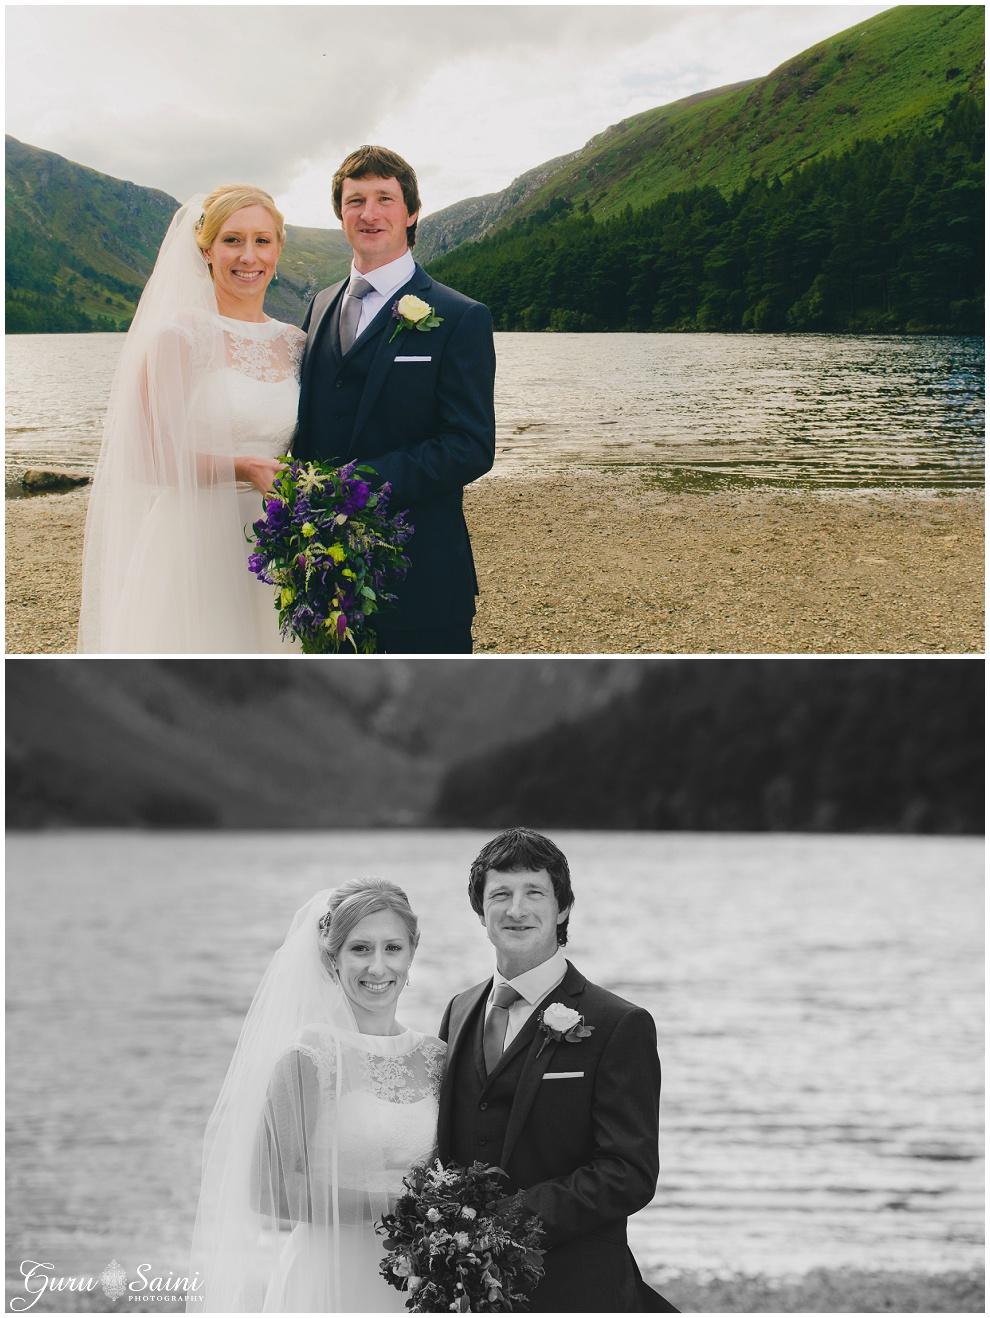 Wedding-Photography-Dublin-Glendalough-London-Guru-Saini-Photography